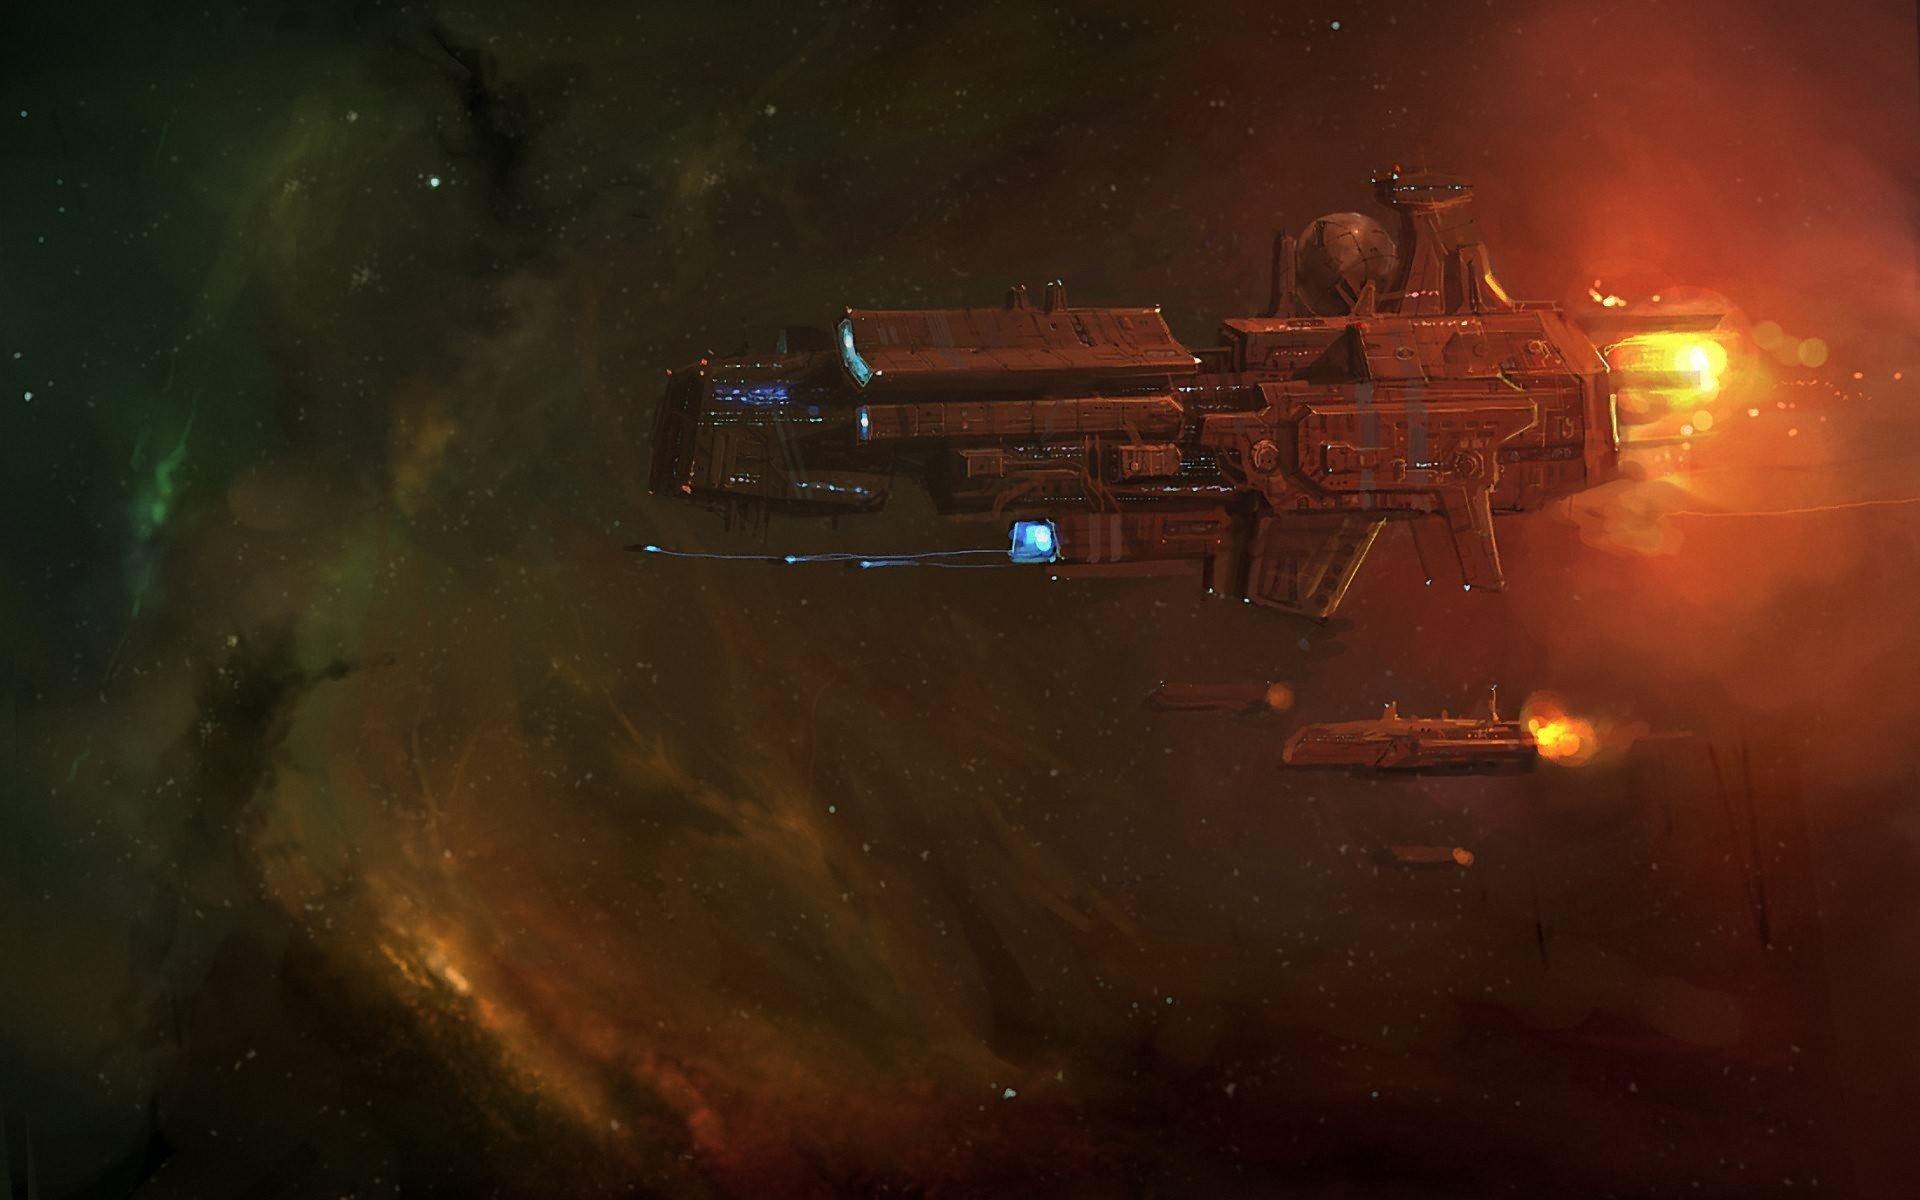 Space, Spaceship, Science Fiction HD Wallpapers / Desktop